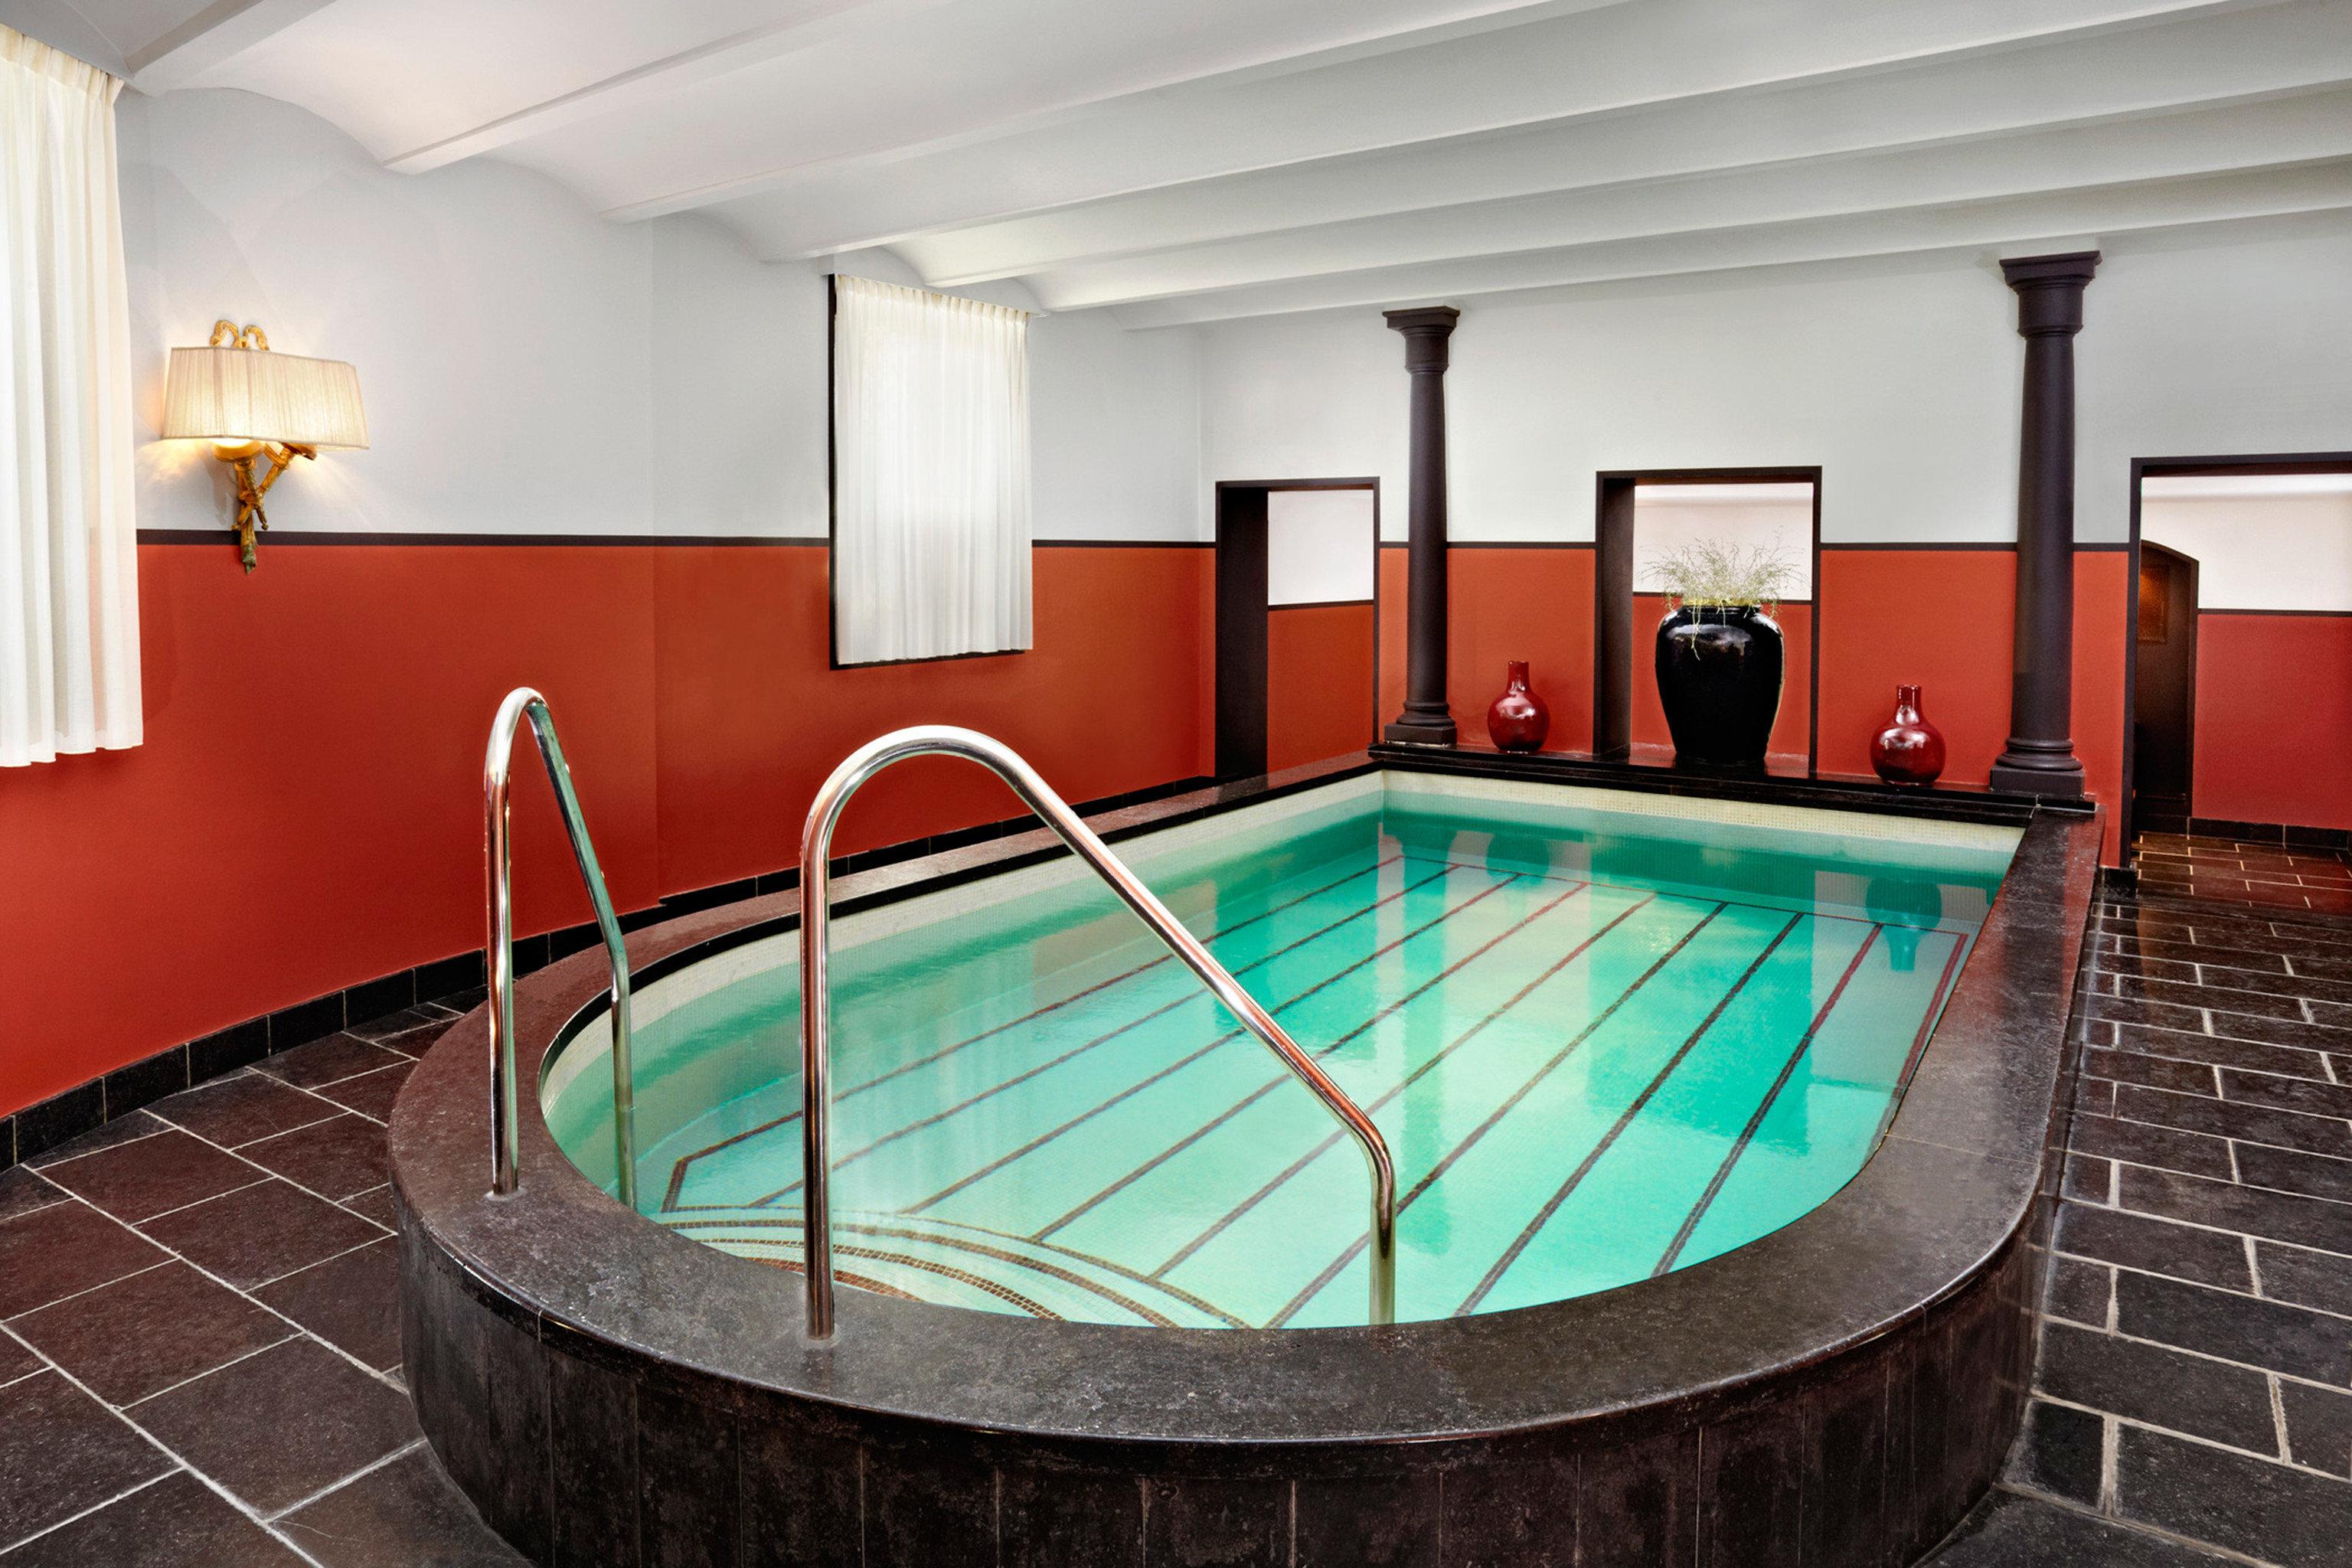 Play Pool Resort swimming pool property Suite billiard room jacuzzi colored